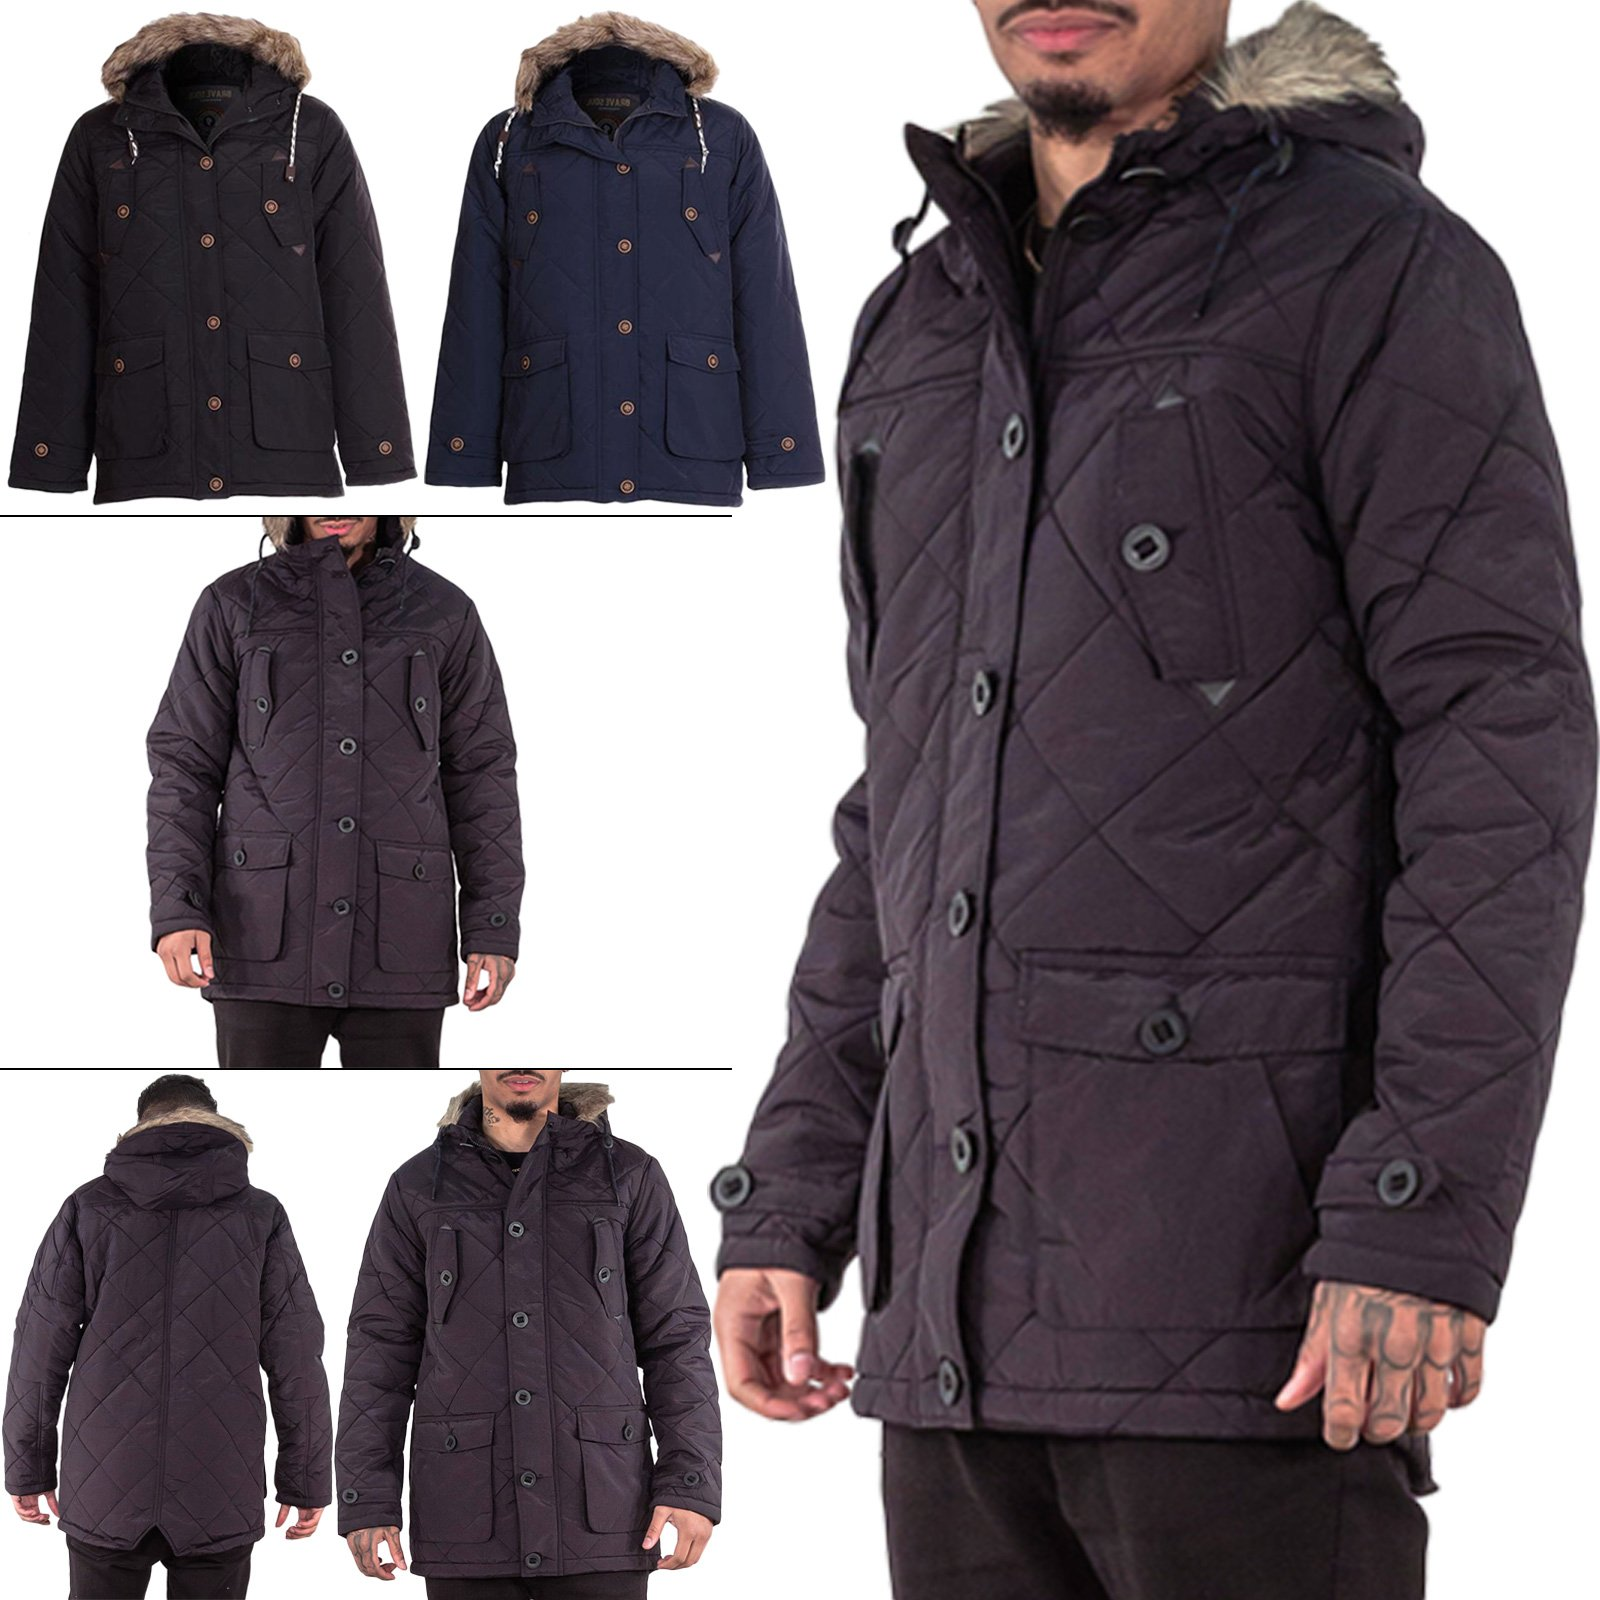 Brave SoulMens Jacket Hooded Drawstring Faux Fur Lining Parka Coat Long Sleeve